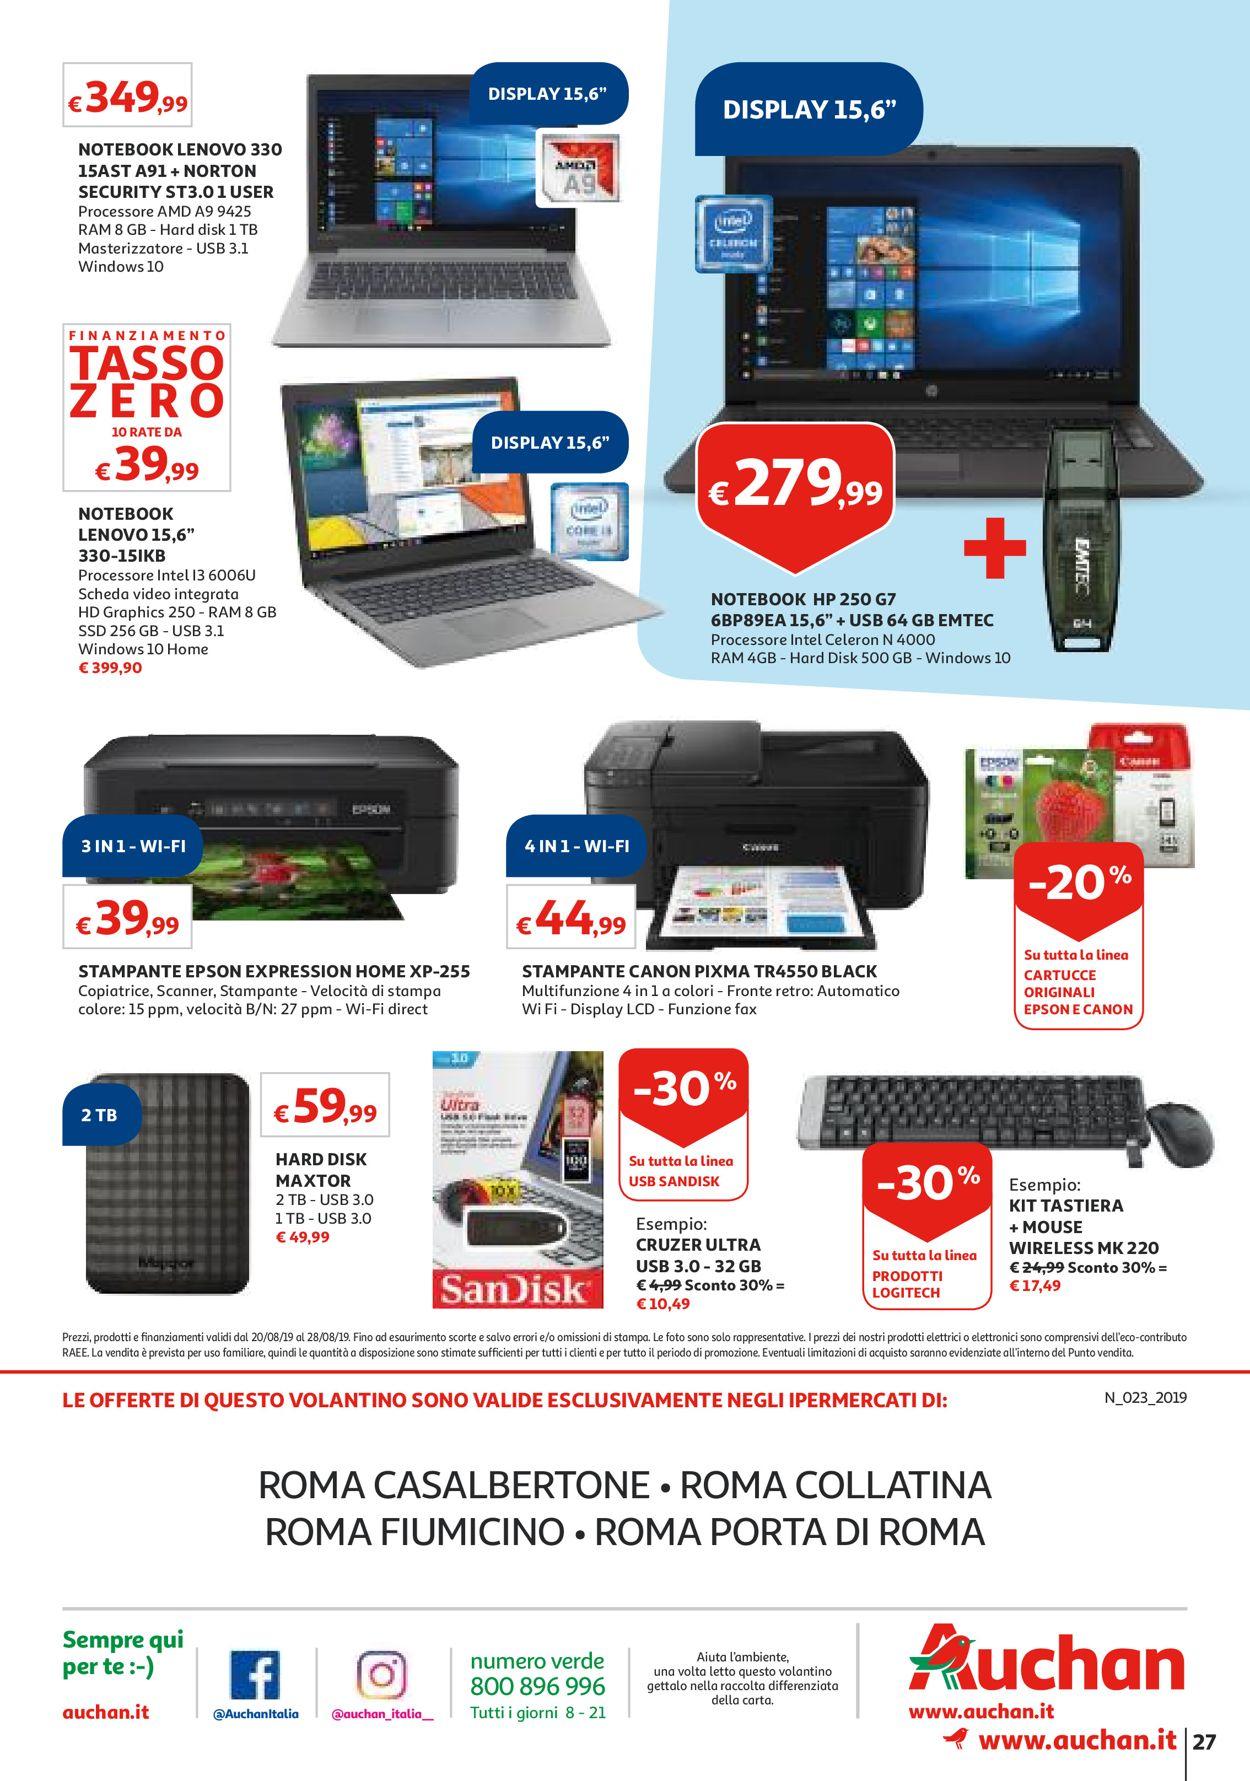 Volantino Auchan - Offerte 20/08-28/08/2019 (Pagina 27)